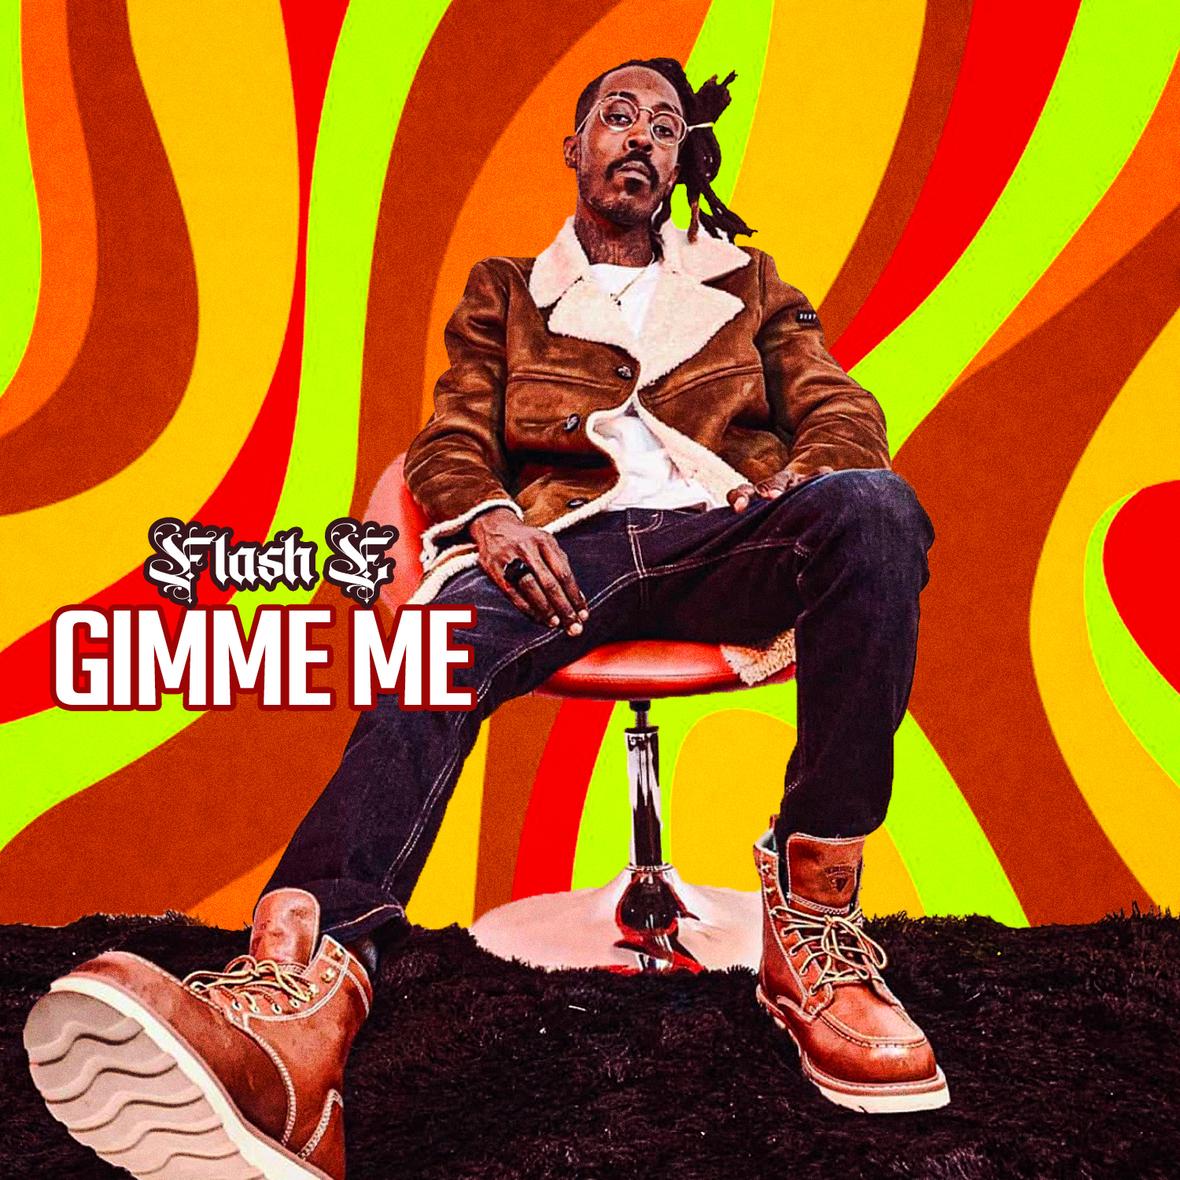 Flash E williams - Gimme Me artwork